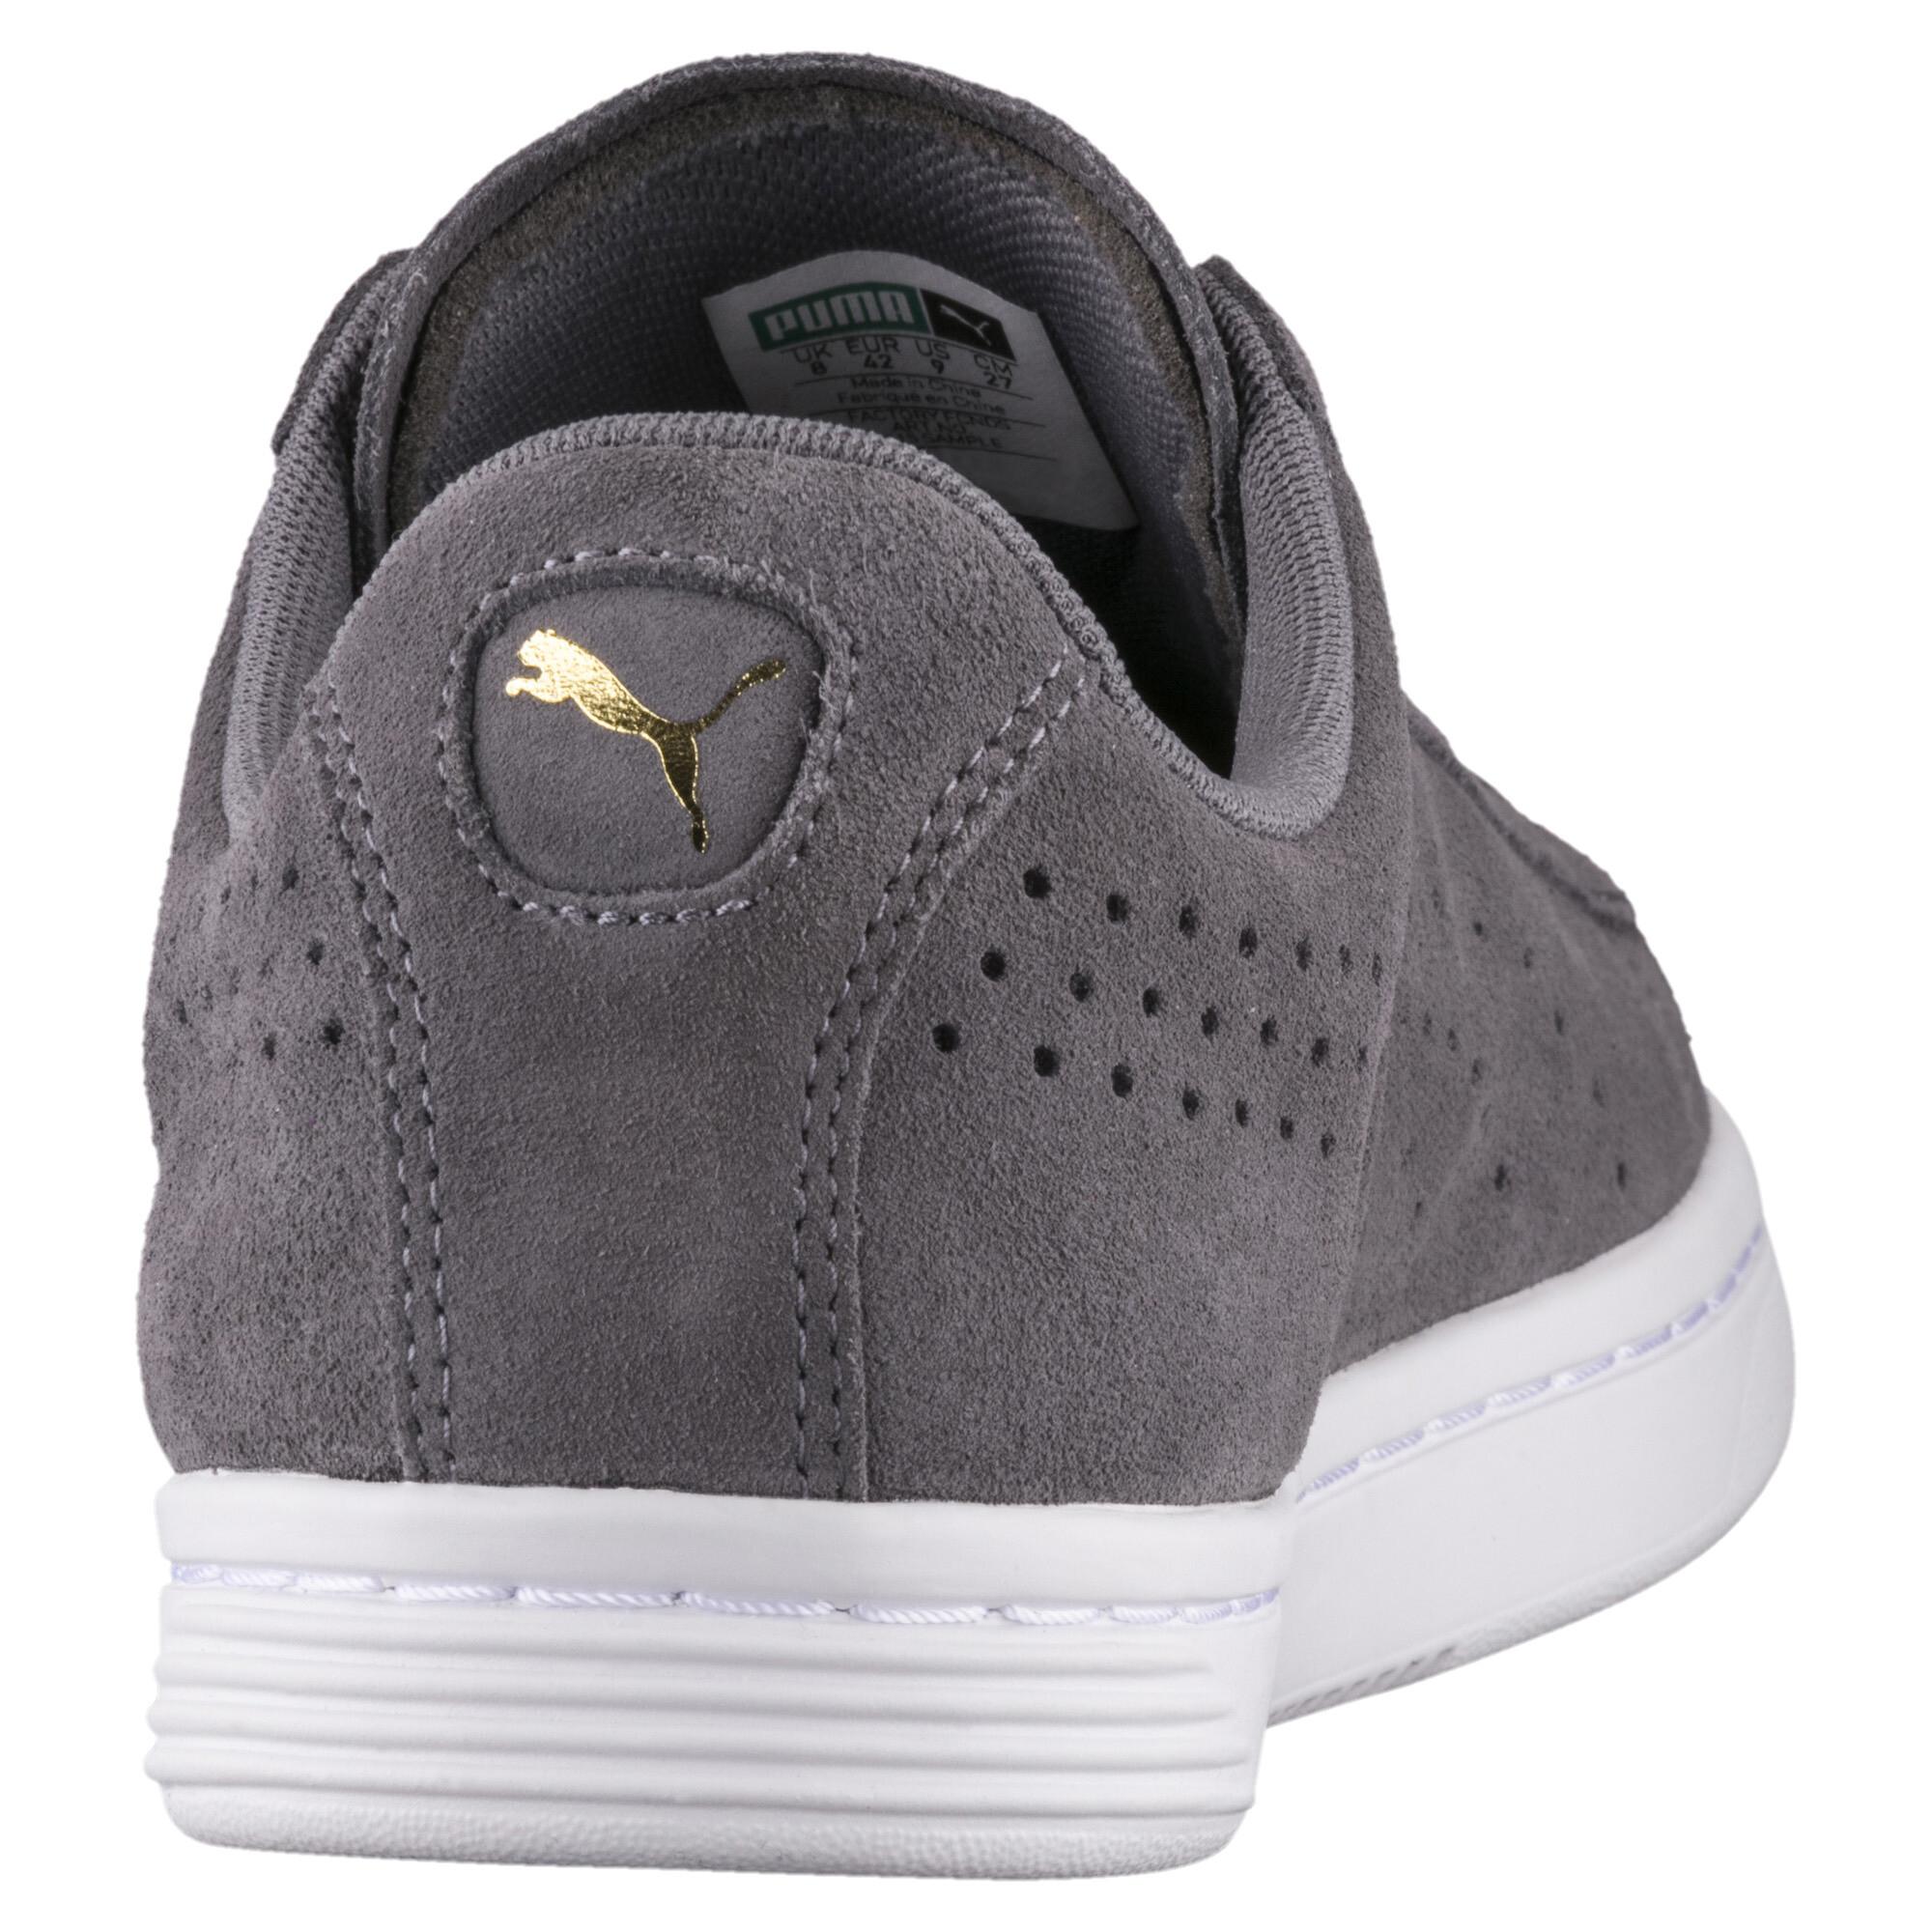 PUMA-Court-Star-Suede-Sneakers-Unisex-Shoe-Sport-Classics thumbnail 10